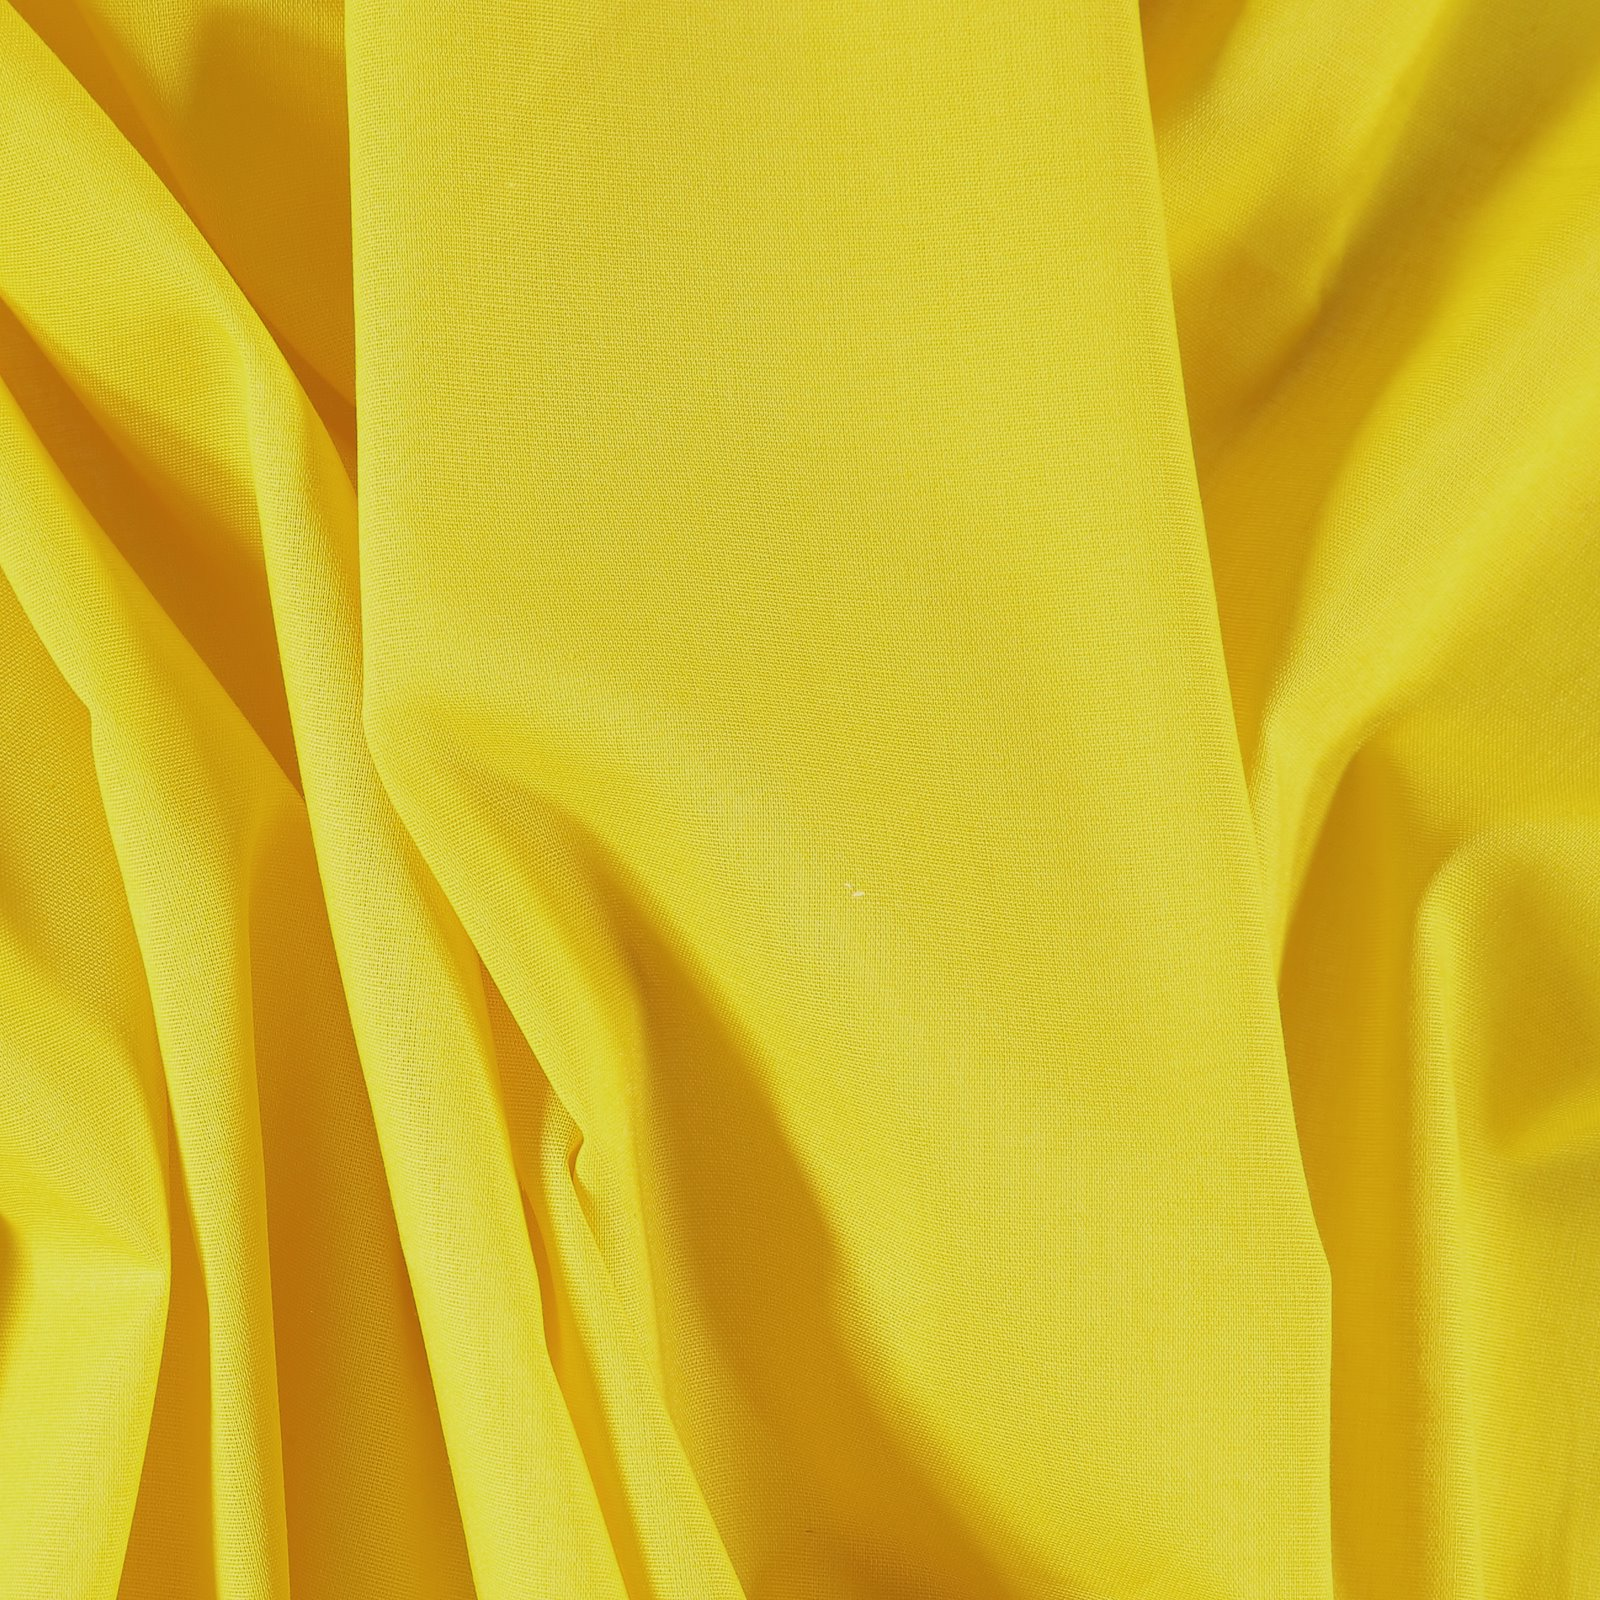 Light woven cotton yellow